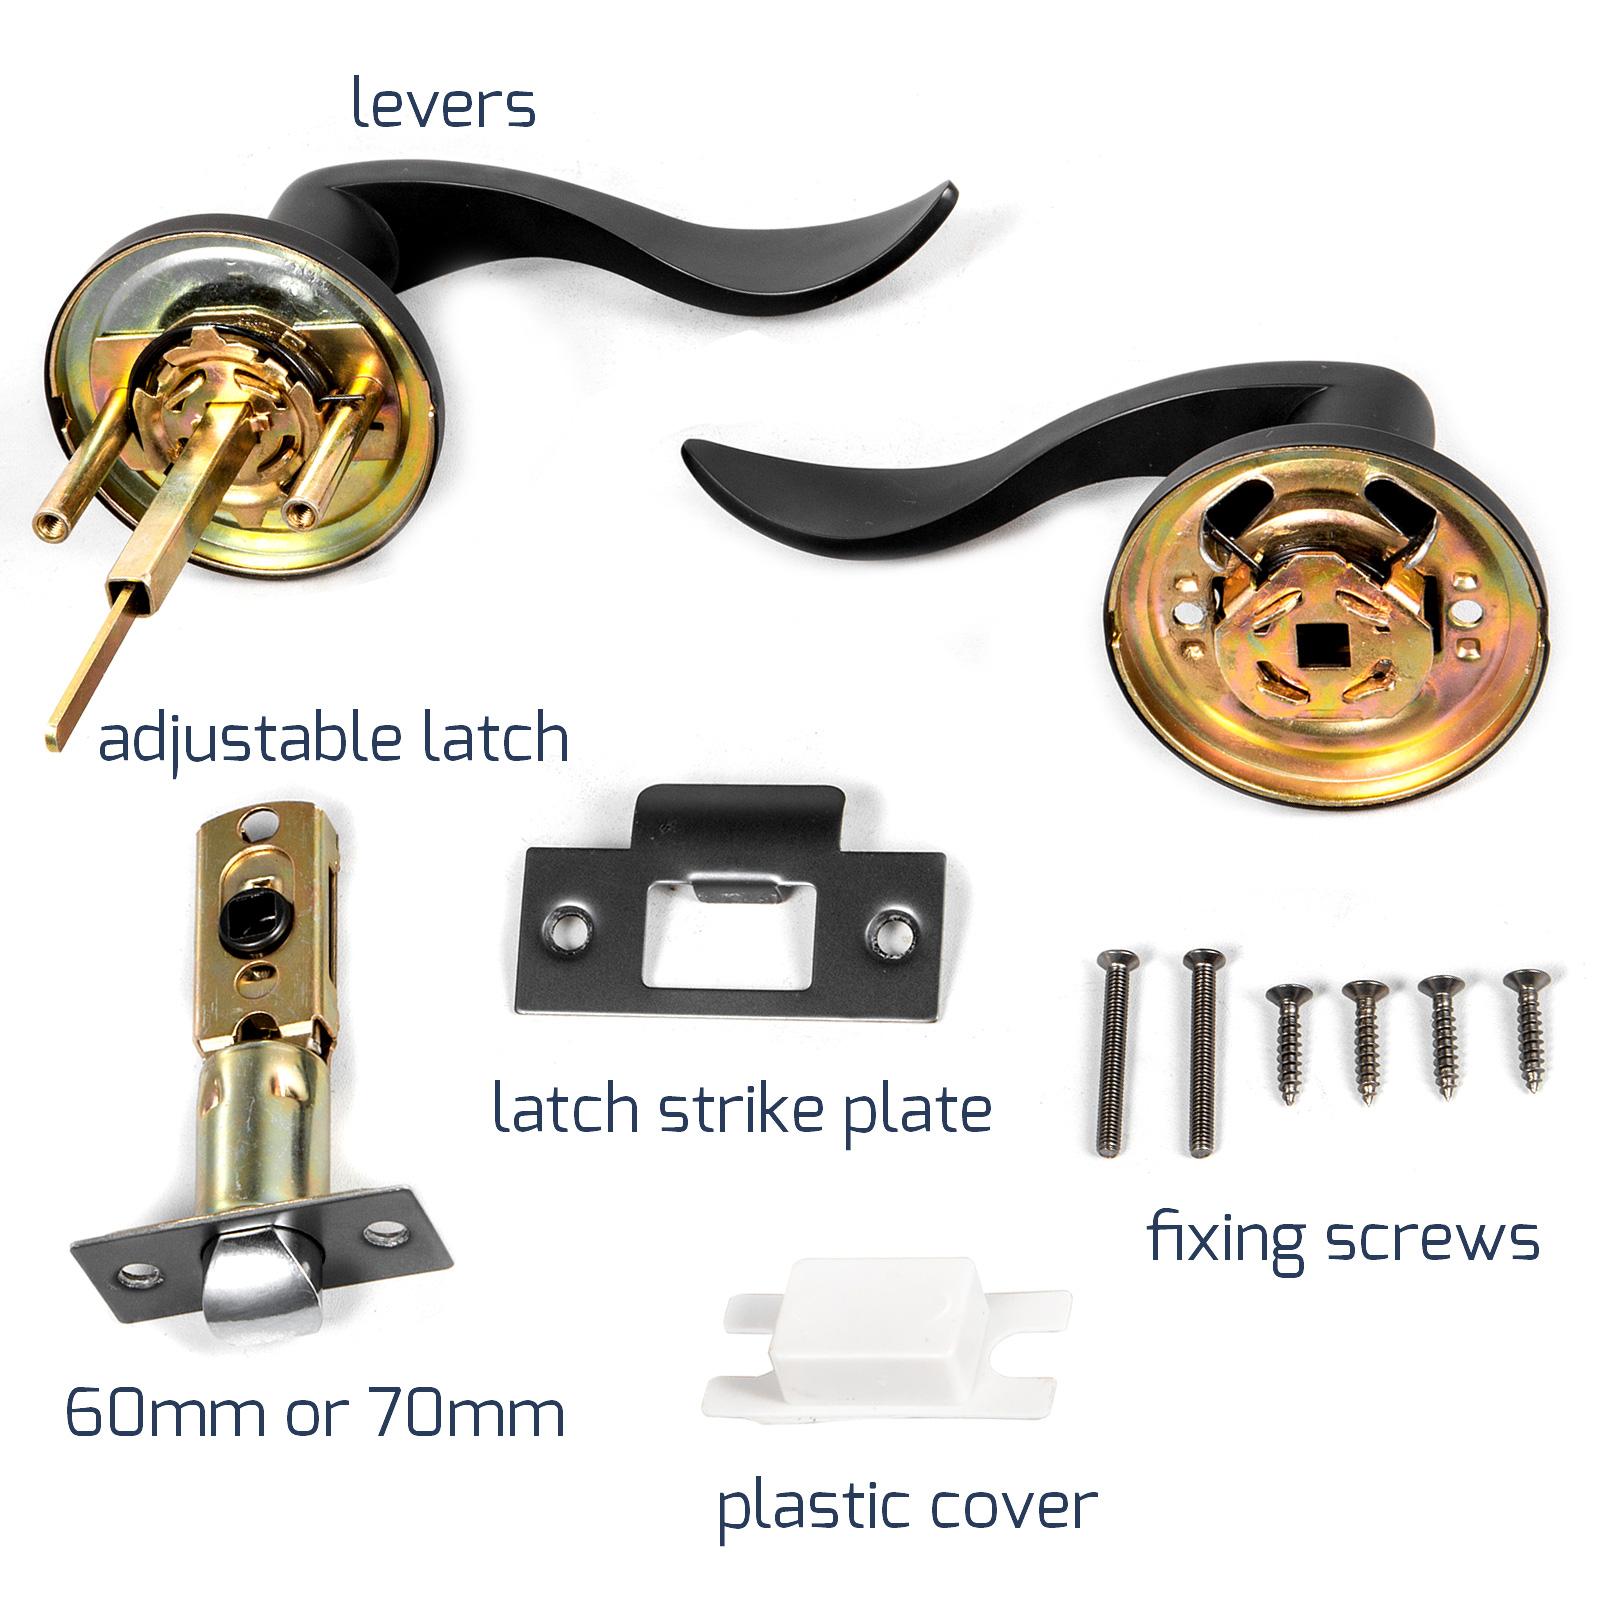 Door-Handles-Matte-Black-Door-Lever-3-5-10-Pack-Passage-Privace-Entry-Lock-Set thumbnail 81